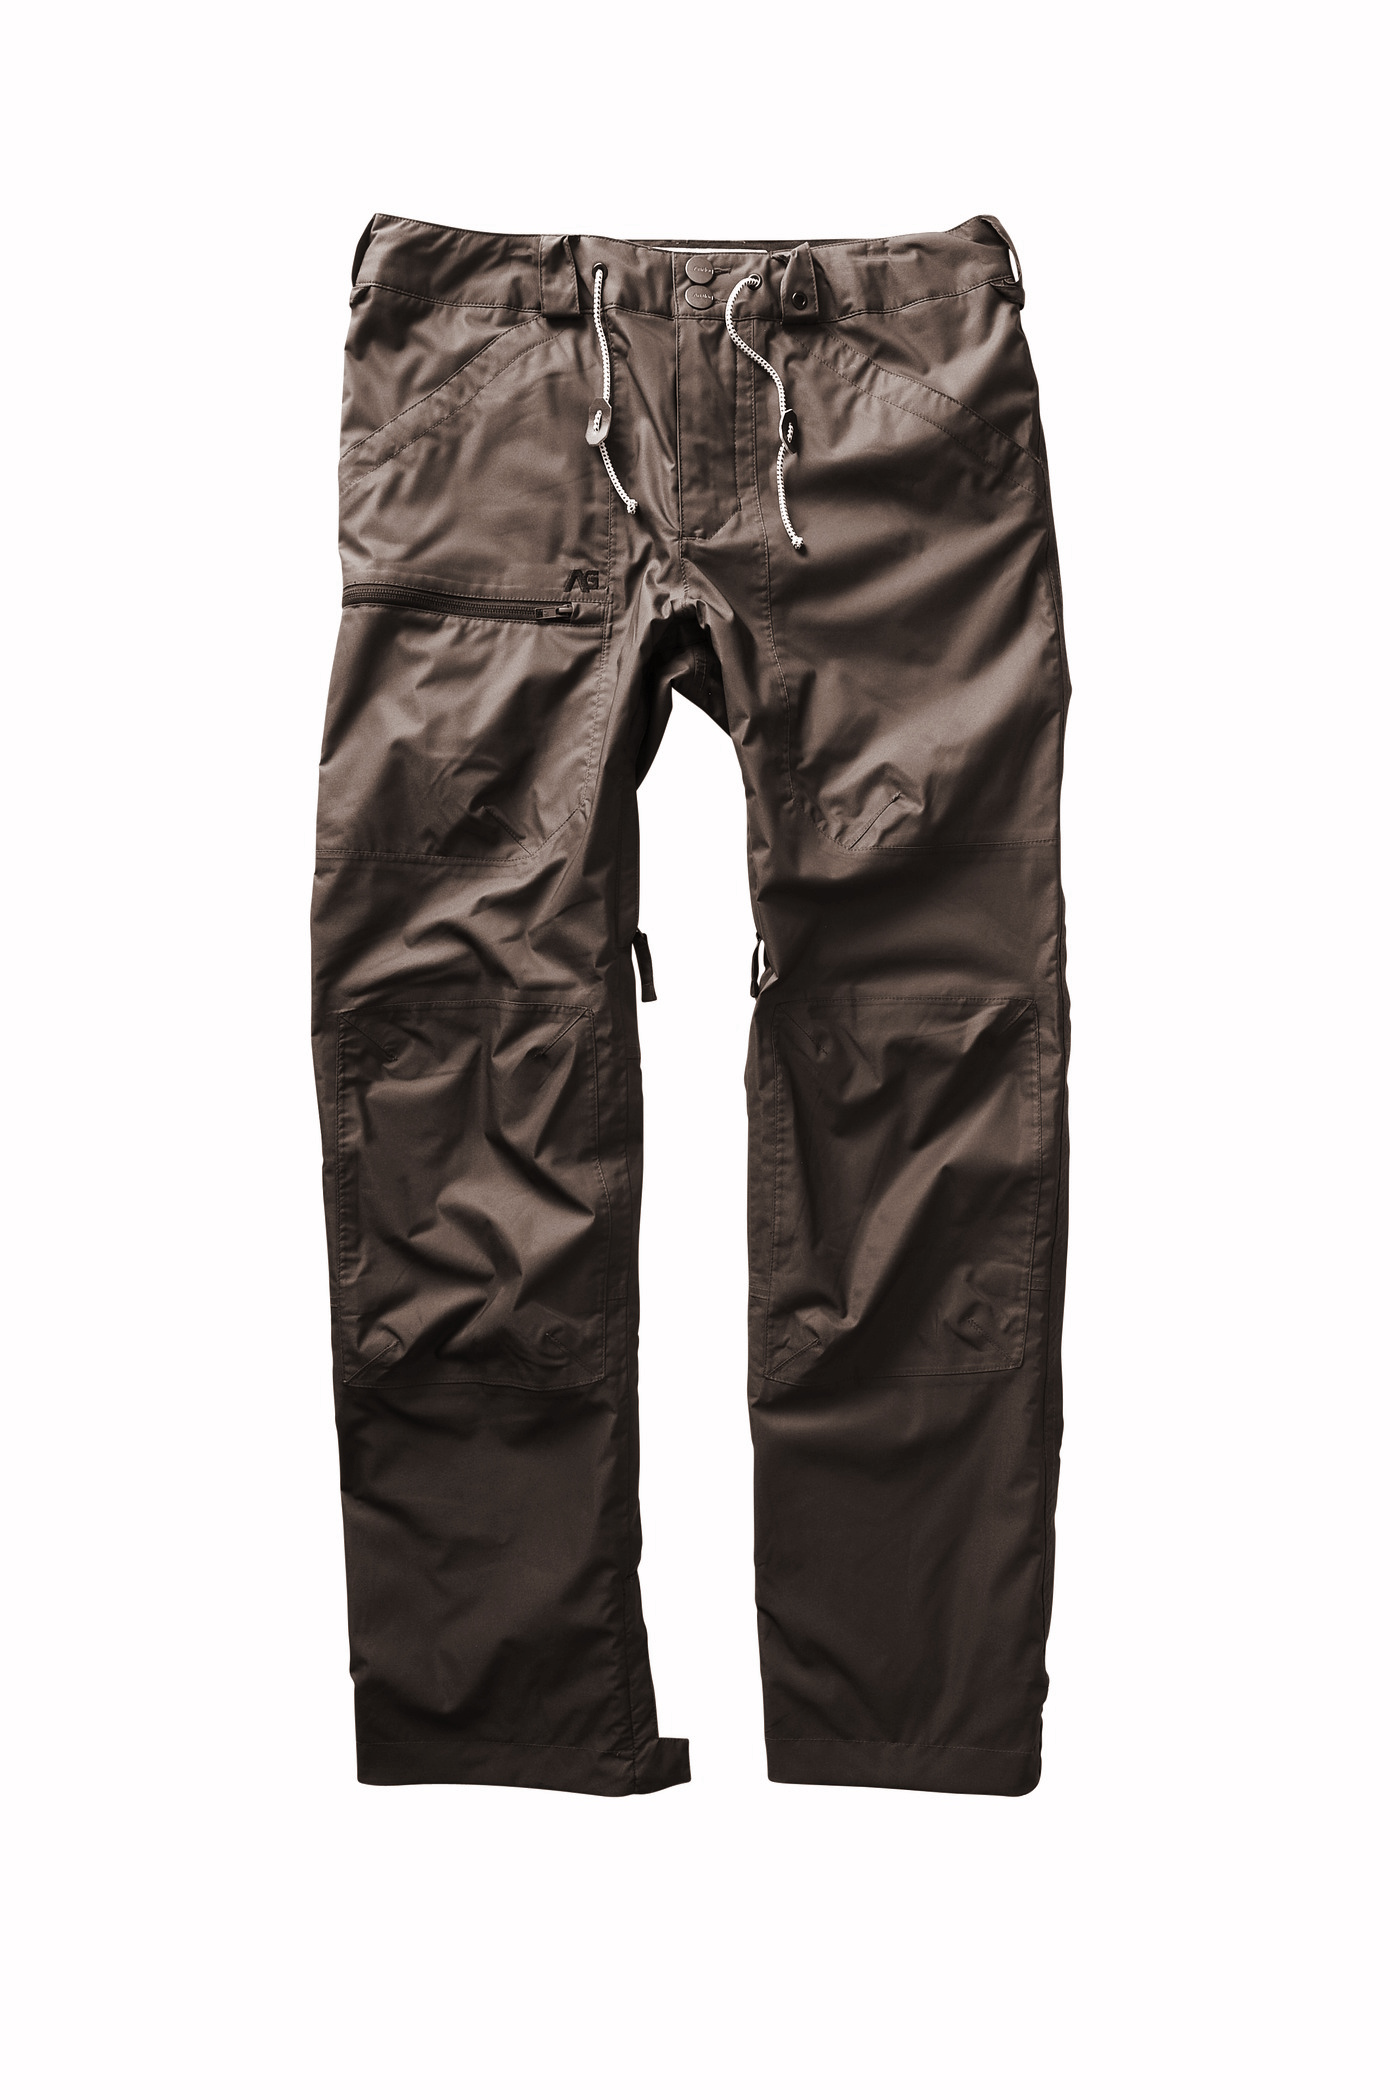 Spodnie Snowboardowe Analog Thievery (Off Black)